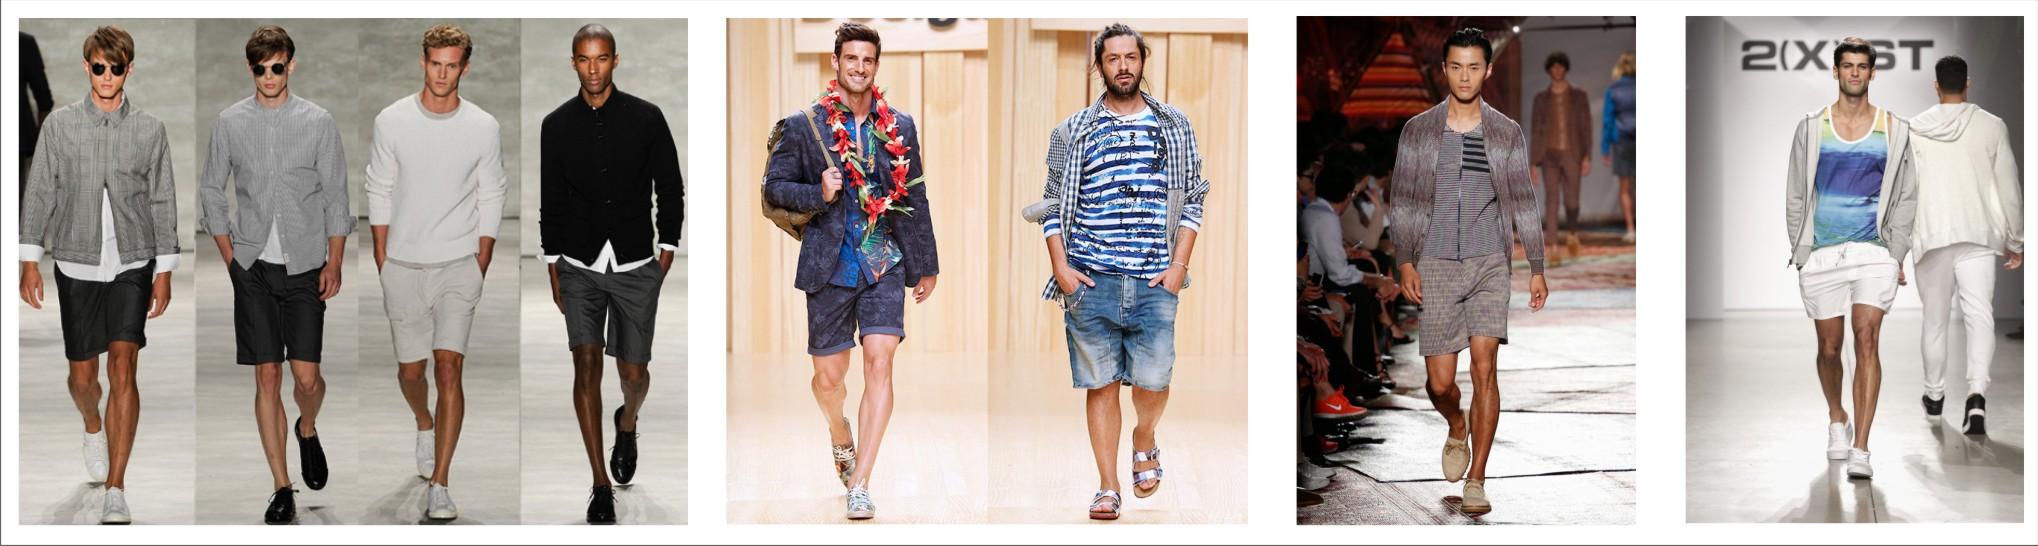 men's shorts 2015